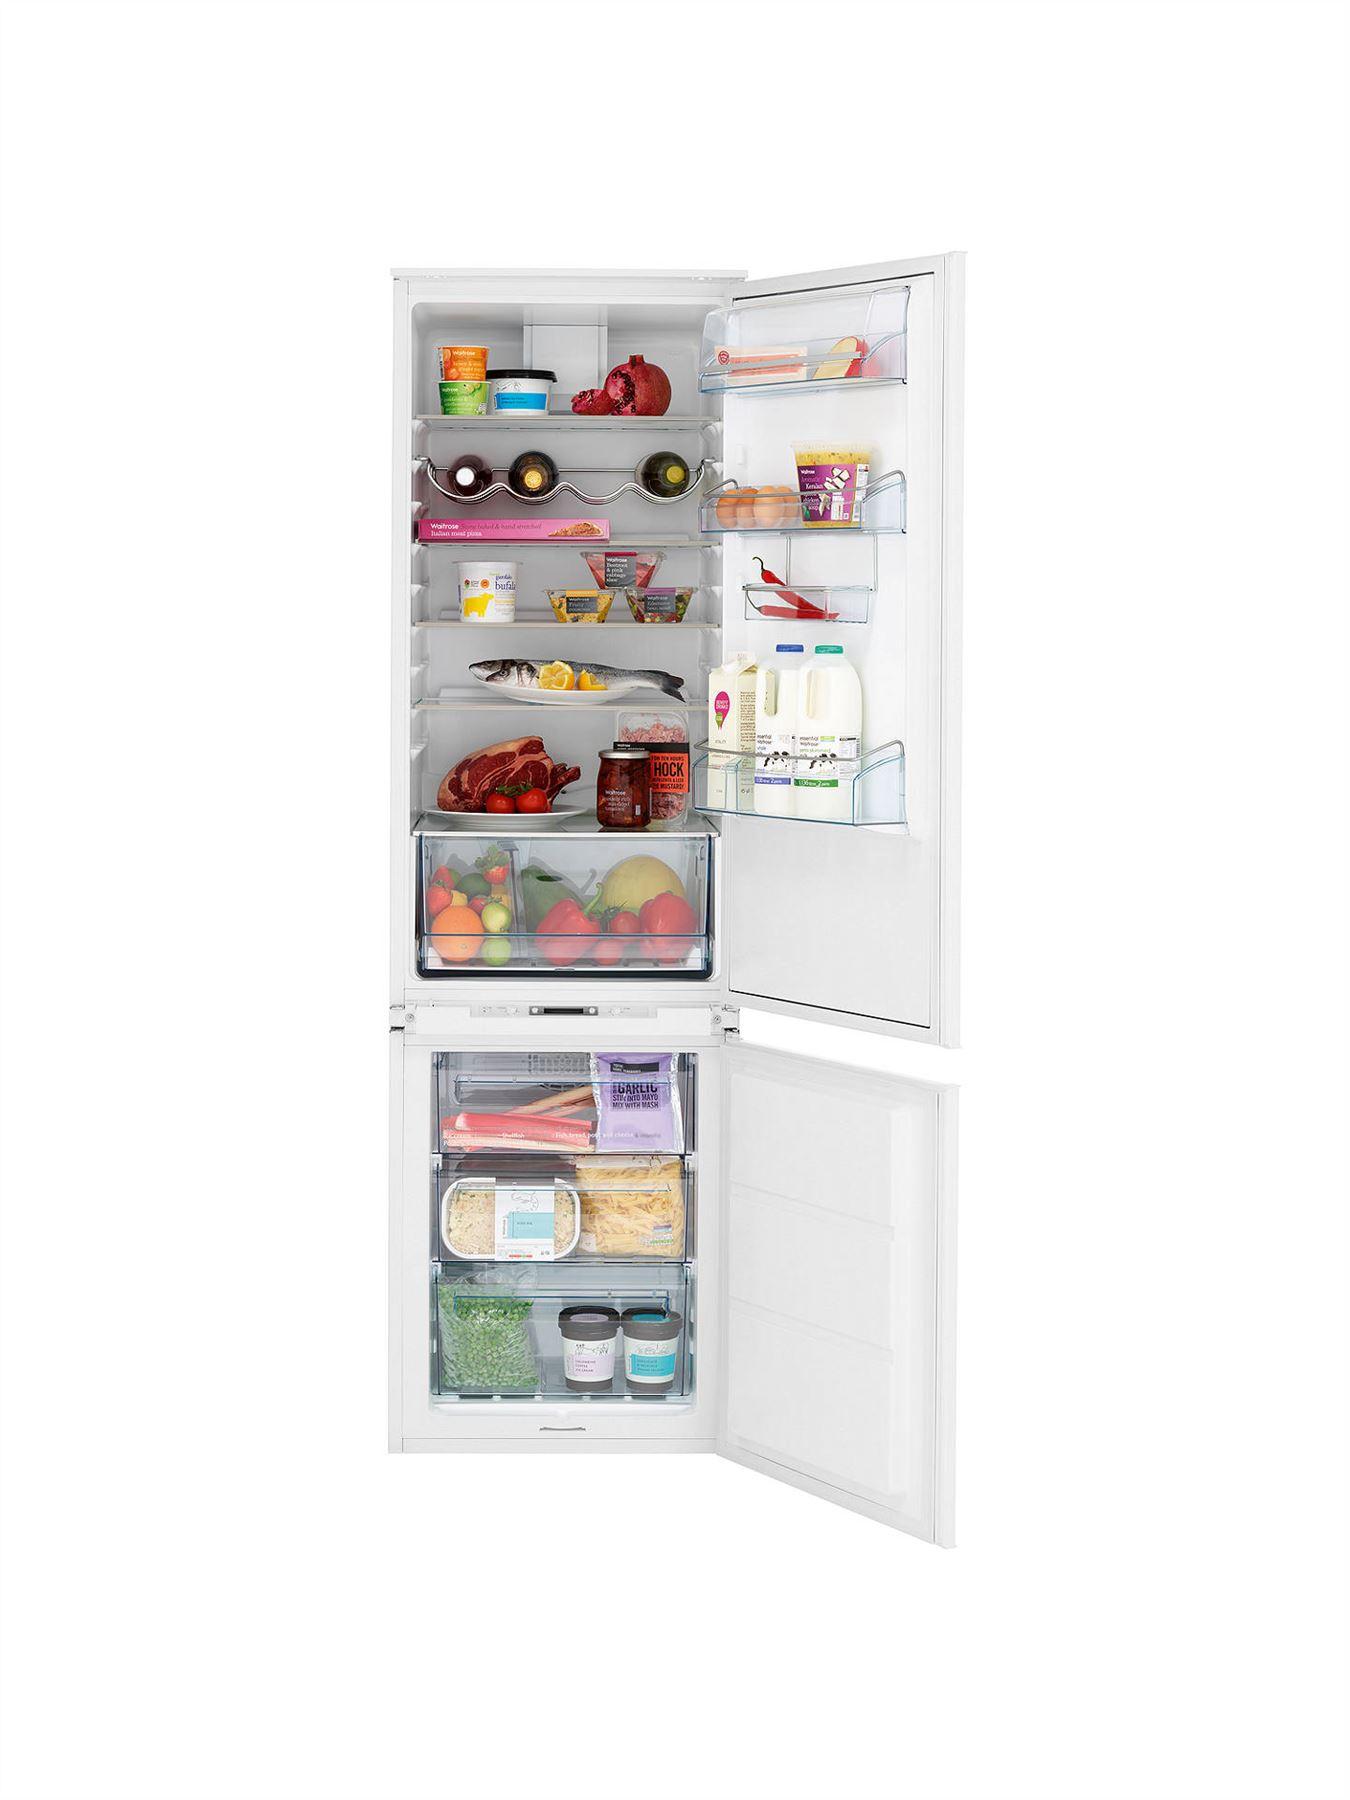 0b03b5c62b54 John Lewis JLBIFF1812 Integrated Fridge Freezer, A+ Energy Rating, 54cm,  White